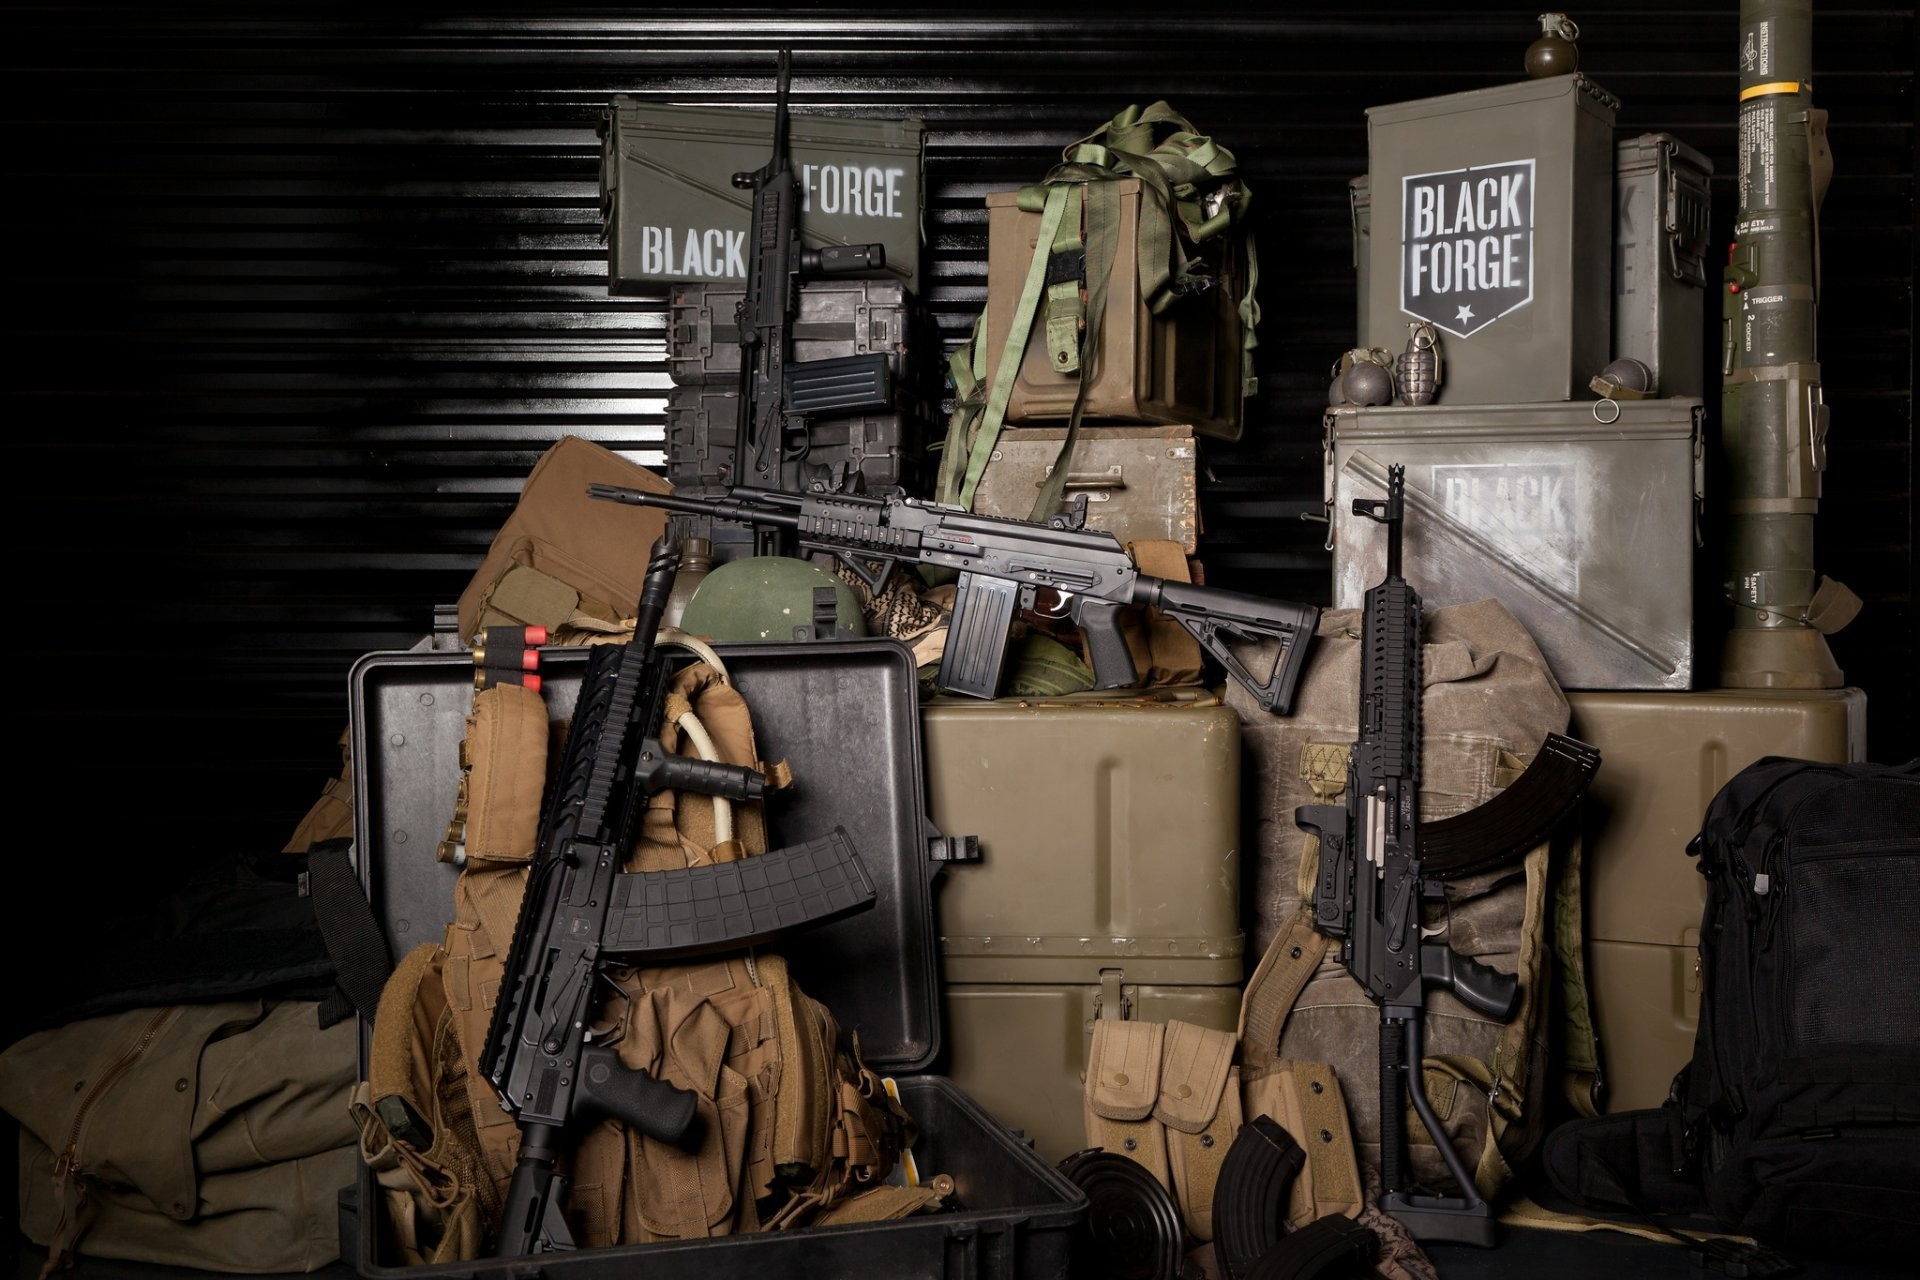 machines boar assault rifles weapon grenade shops boxes handbags equipment  military ammunition